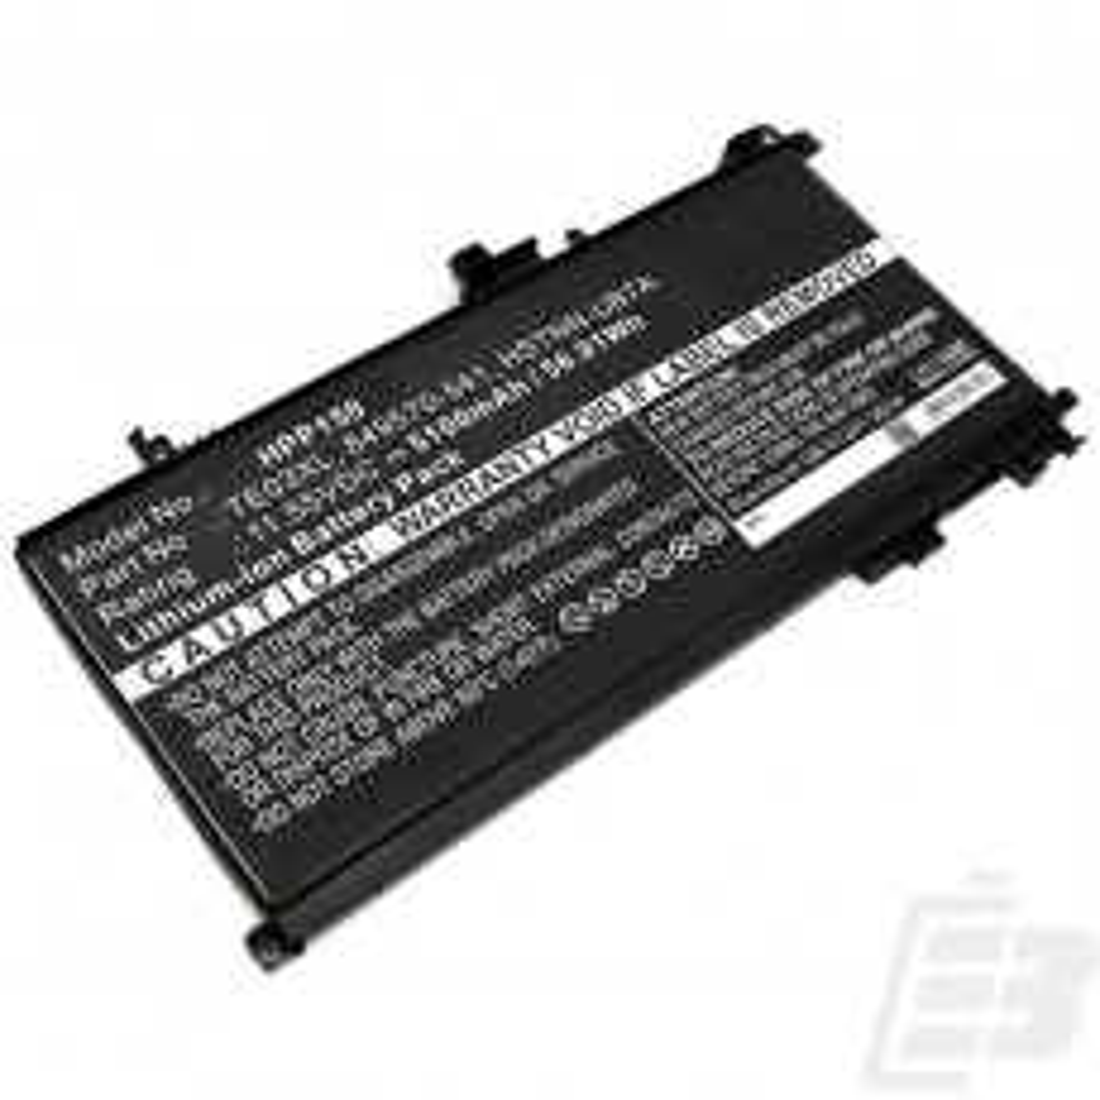 Laptop battery HP Pavilion 15 UHD_1